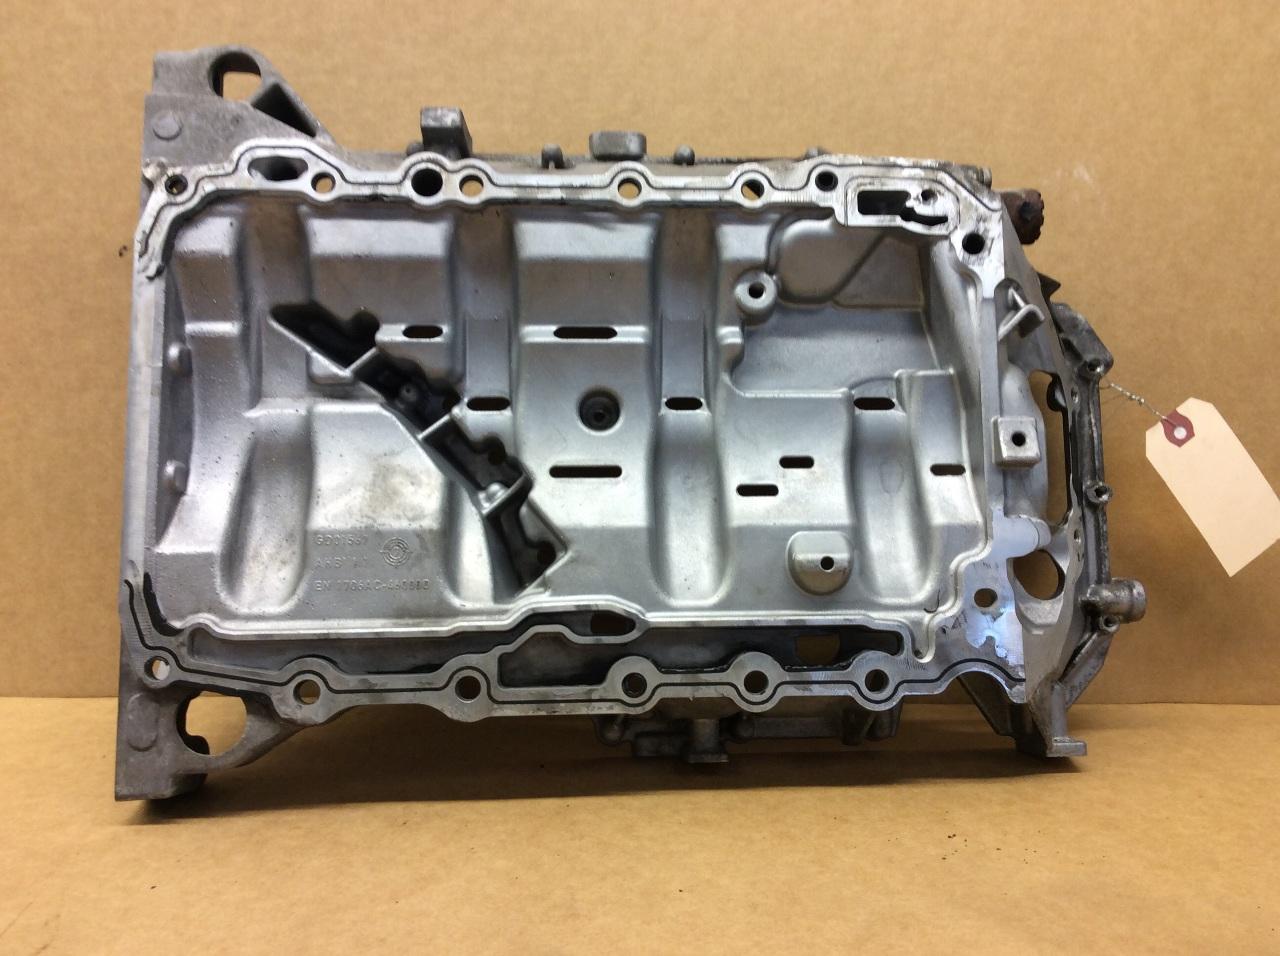 2009 2010 2011 2012 audi a4 a5 q5 caeb upper oil pan 06h103603s Audi a5 motor oil